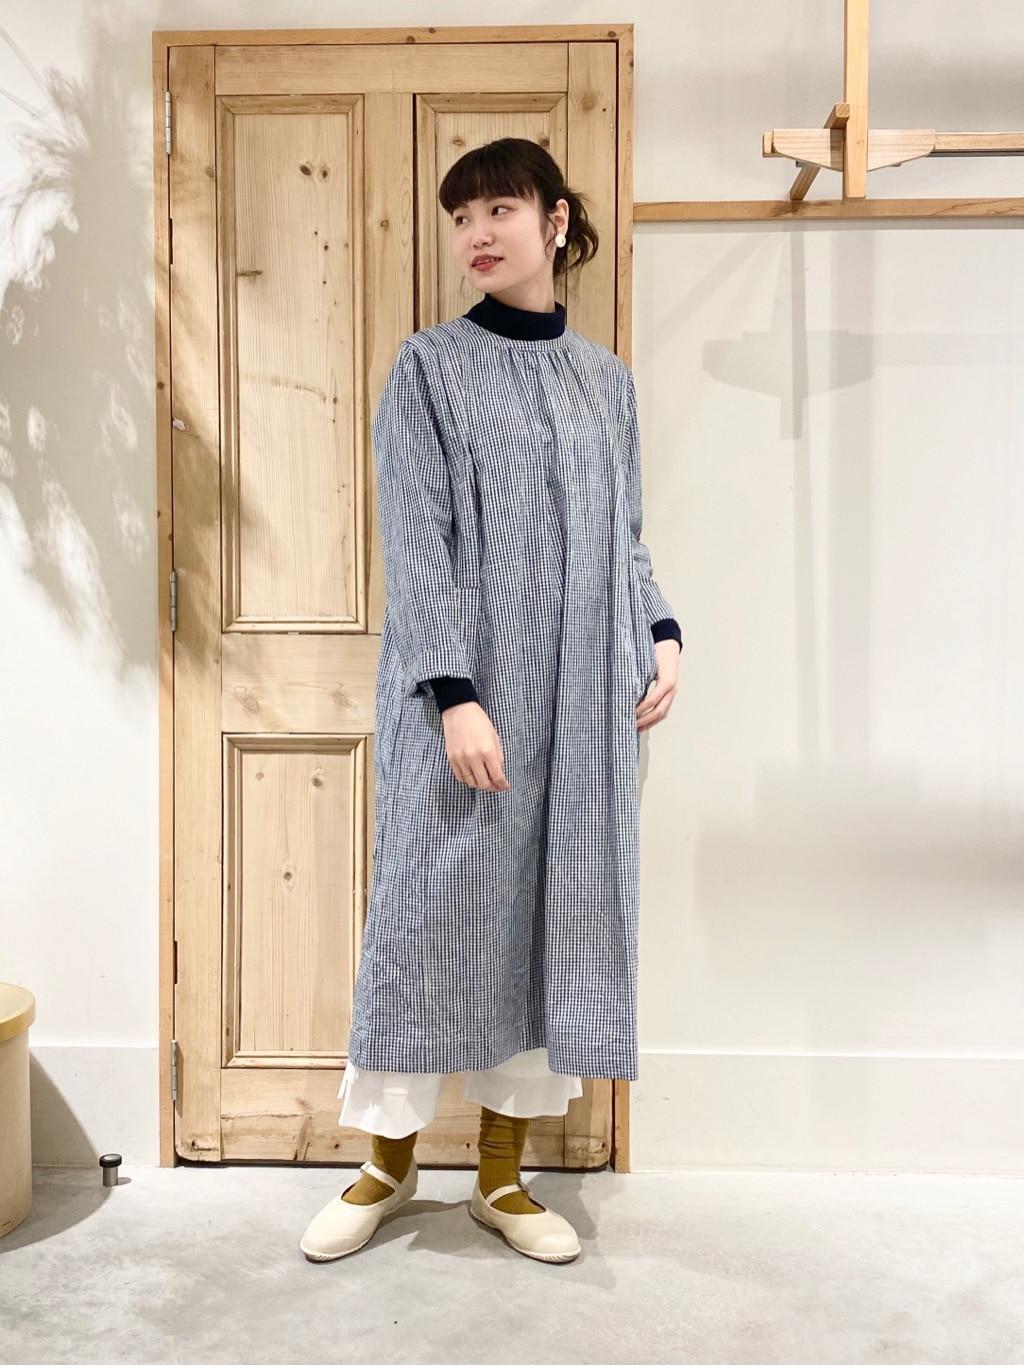 Malle chambre de charme 調布パルコ 身長:167cm 2020.10.27